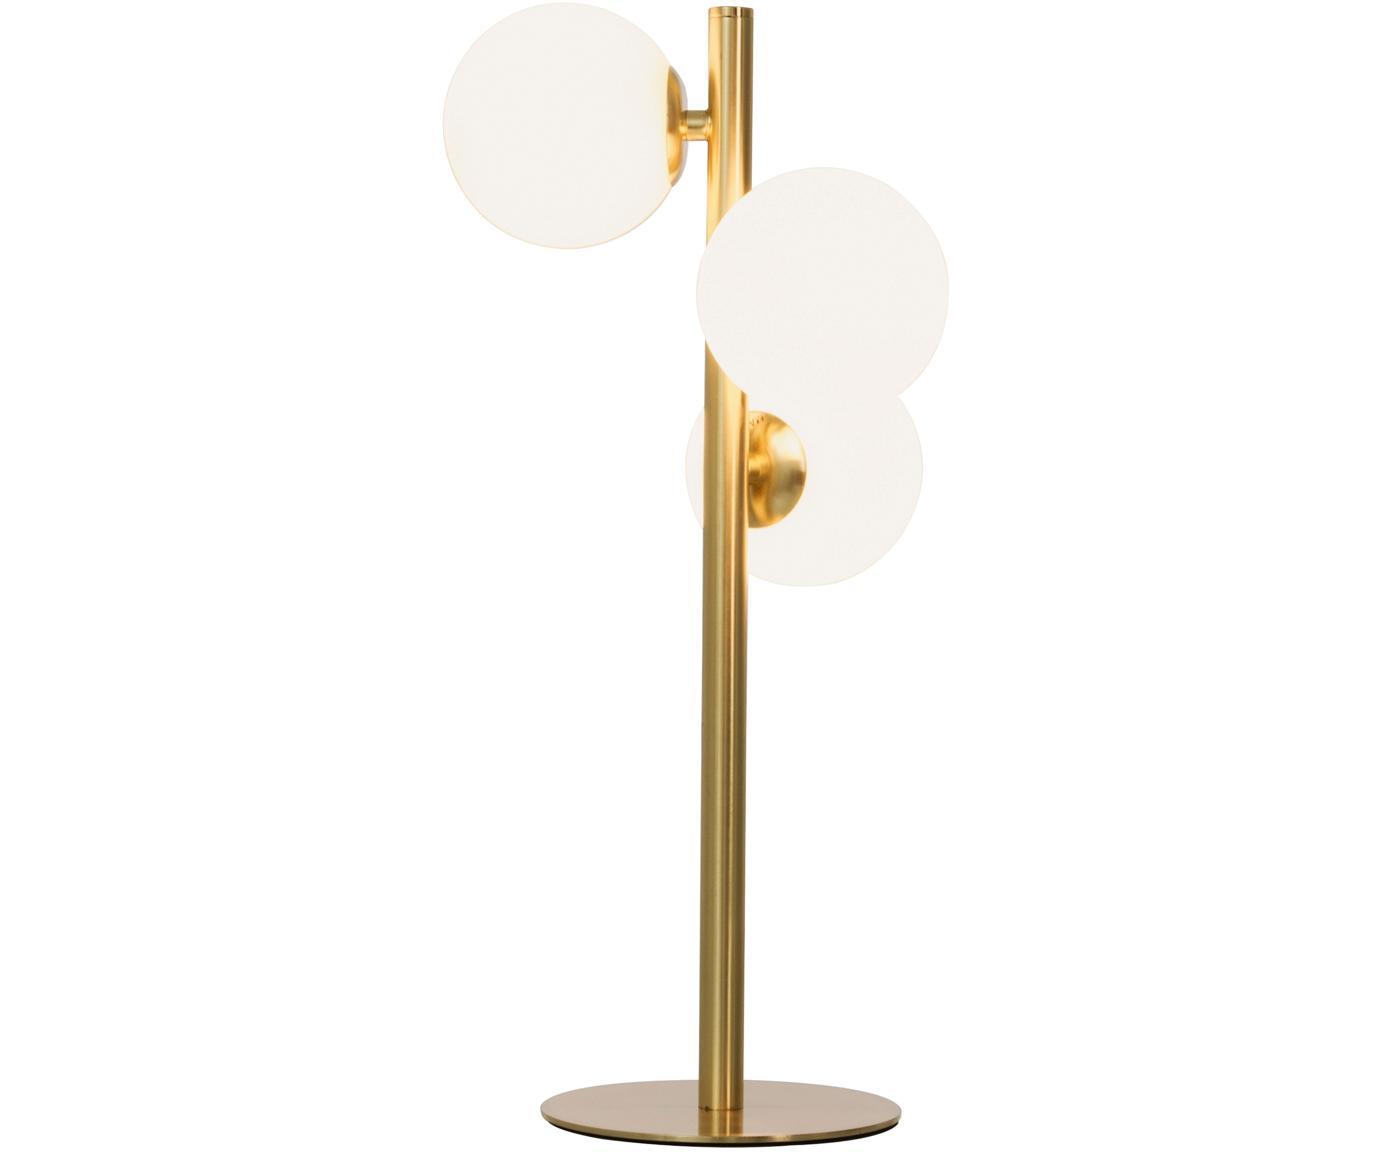 Tischleuchte Molekyl, Lampenschirm: Opalglas, Lampenfuß: Messing, Messing, Opalweiß, 24 x 46 cm